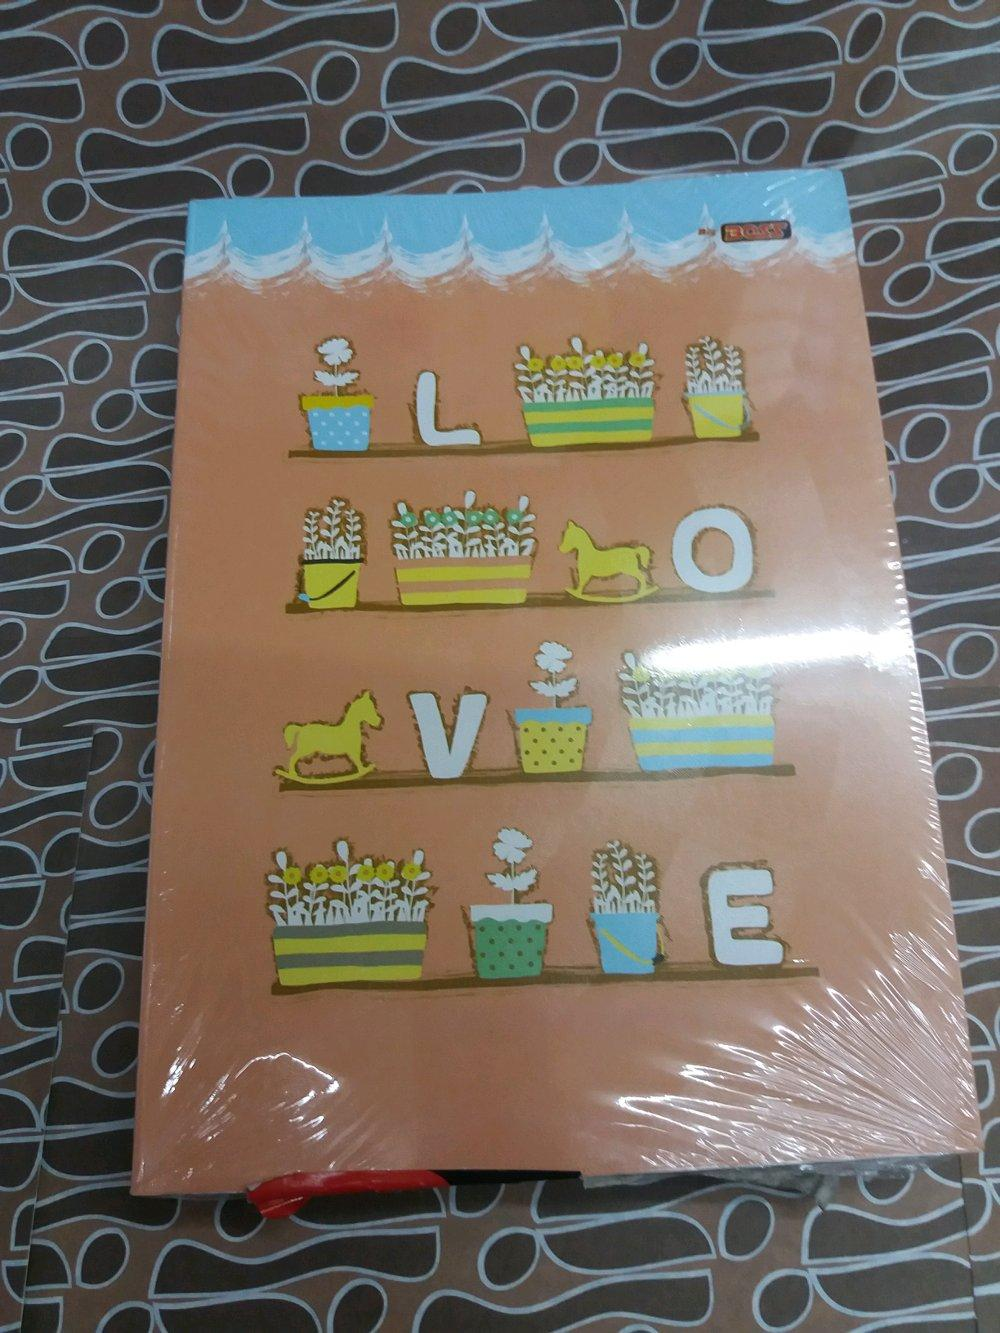 Review Sampul Buku Coklat Ukuran Boxy Big Boss Campus Pak Isi 20 Gambar Tulis Sekolah 42 Lembar 1 6